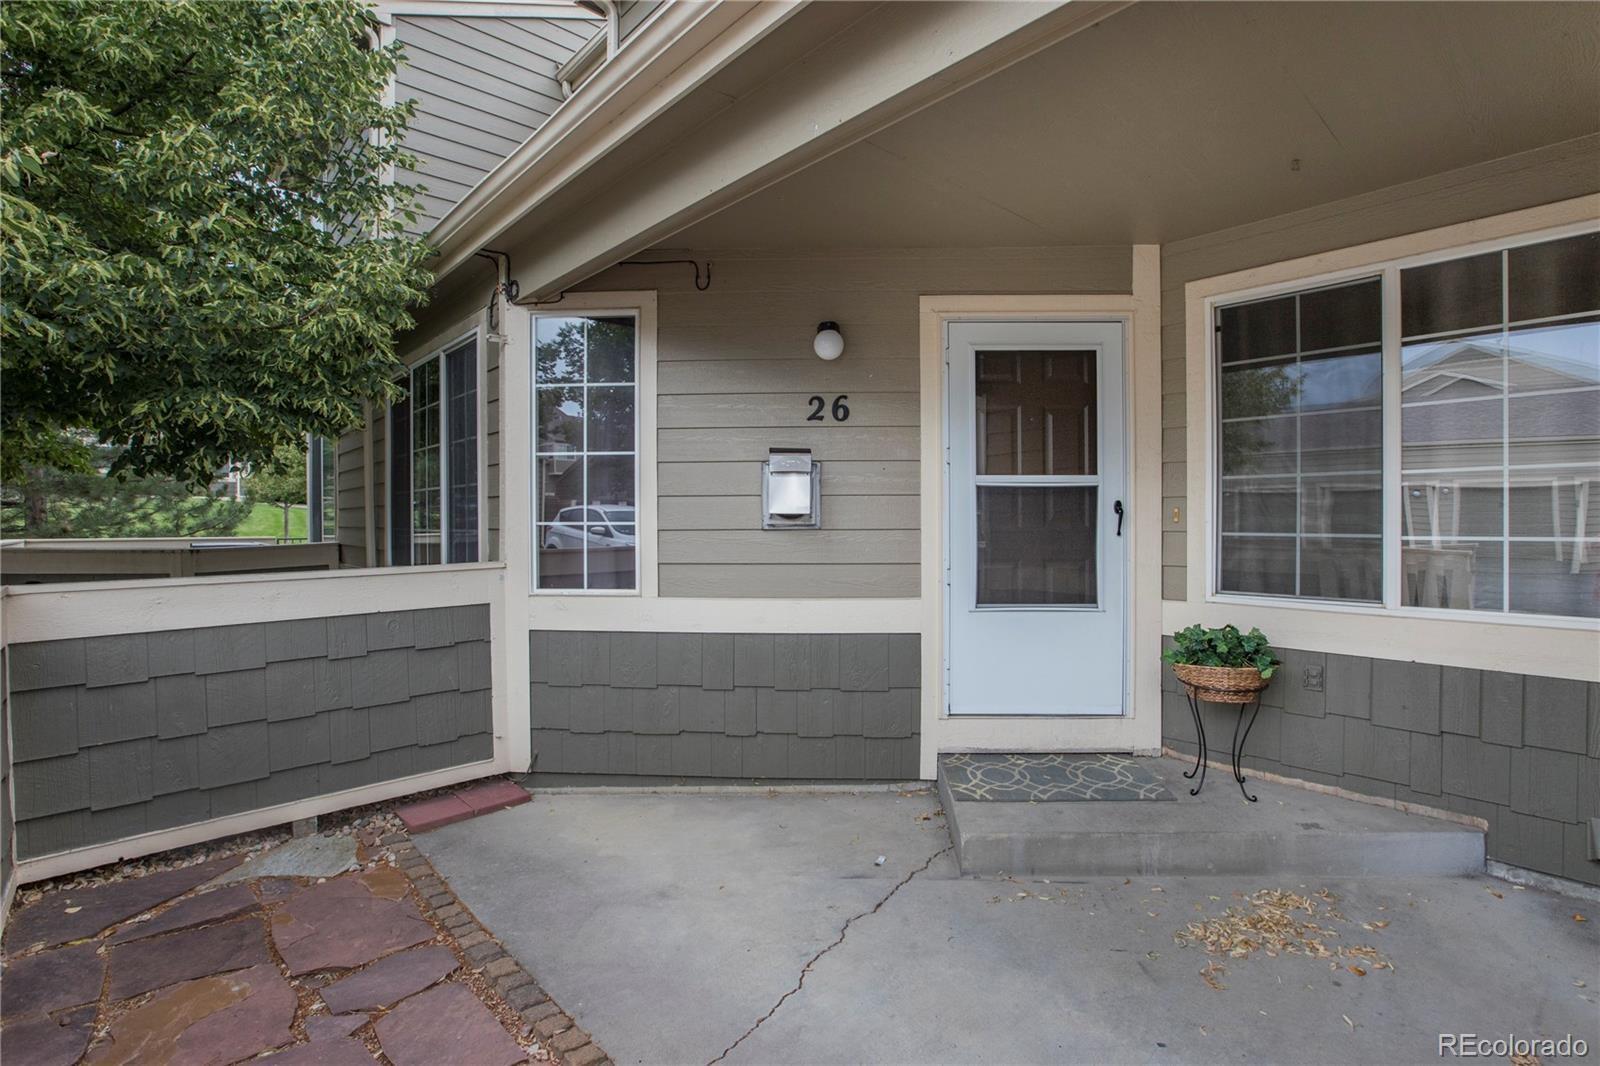 MLS# 3758449 - 3 - 6802 Antigua Drive #26, Fort Collins, CO 80525